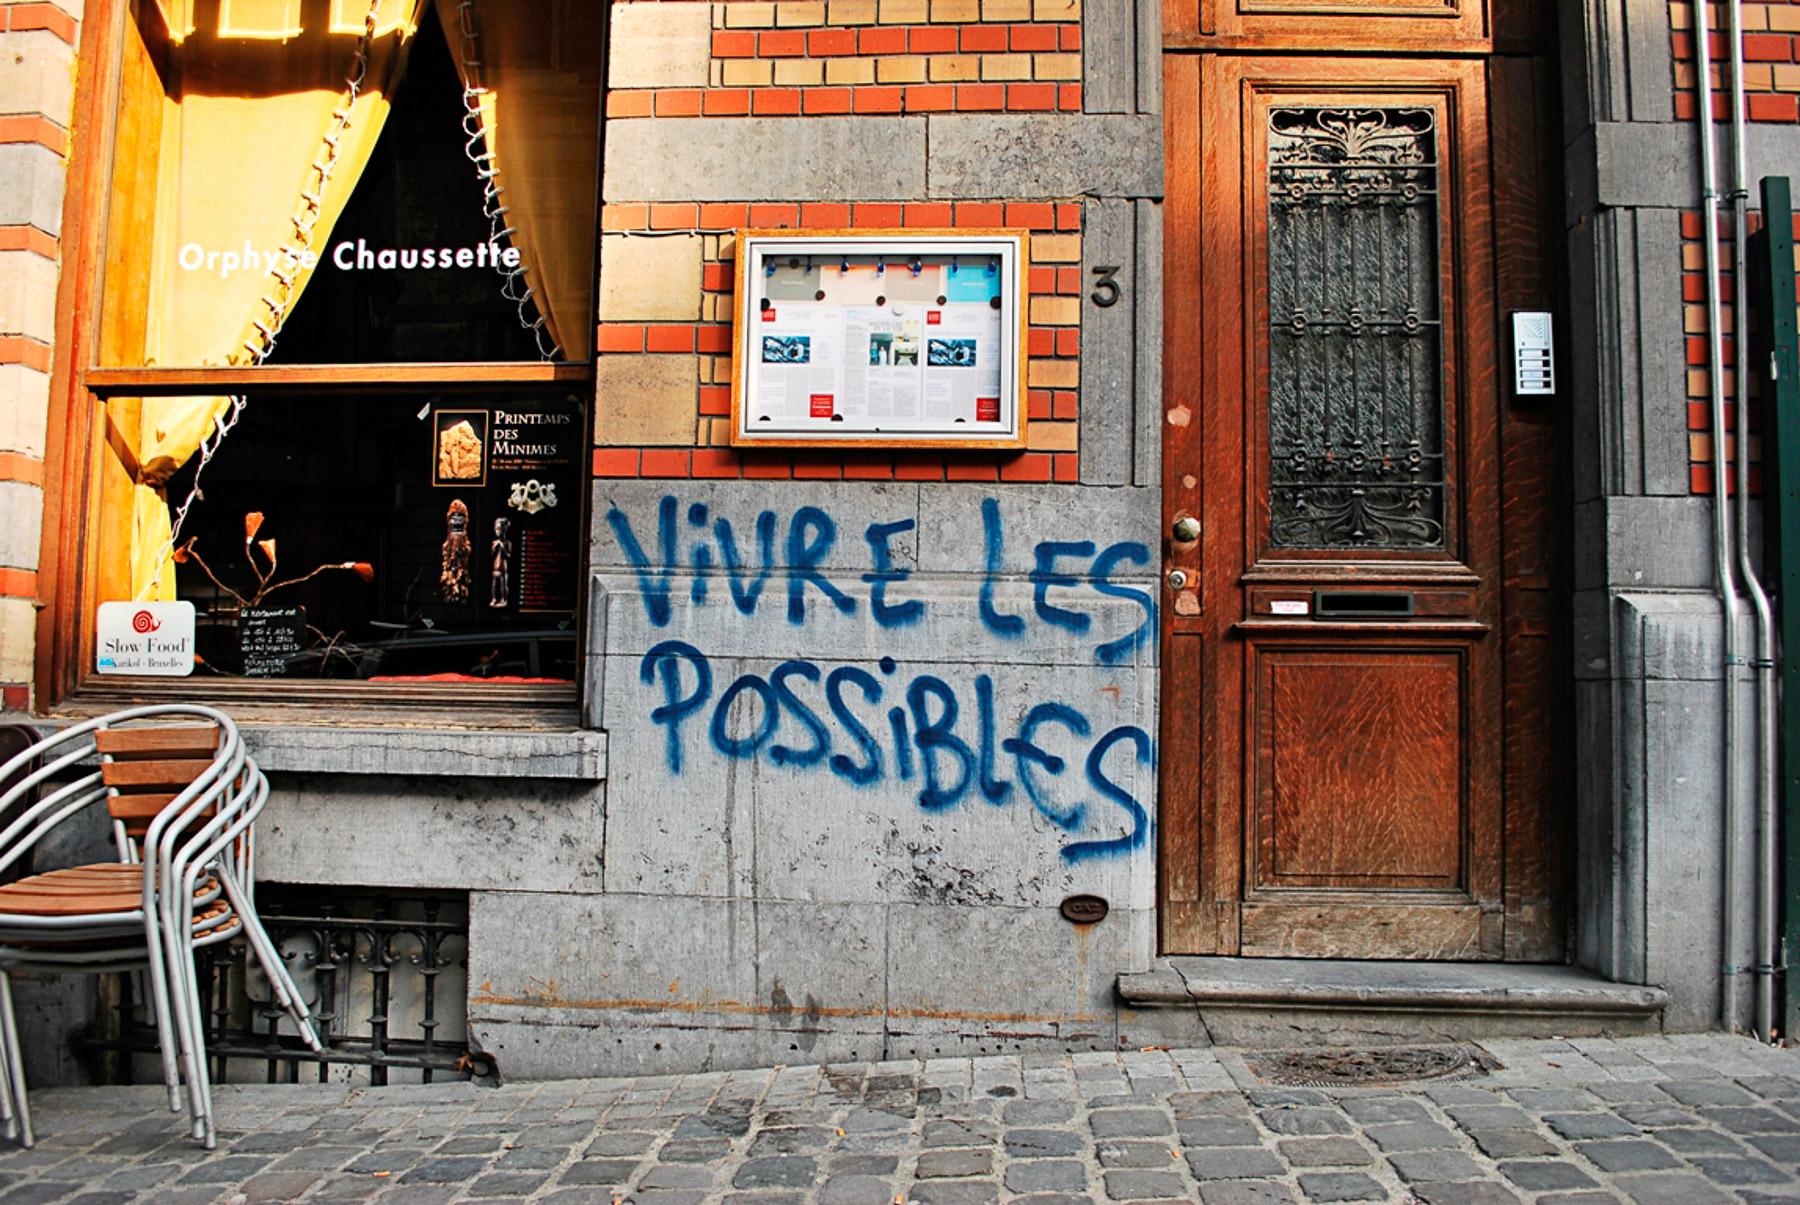 patricia-vanrespaille-photographer-life-through-my-lens-004.jpg